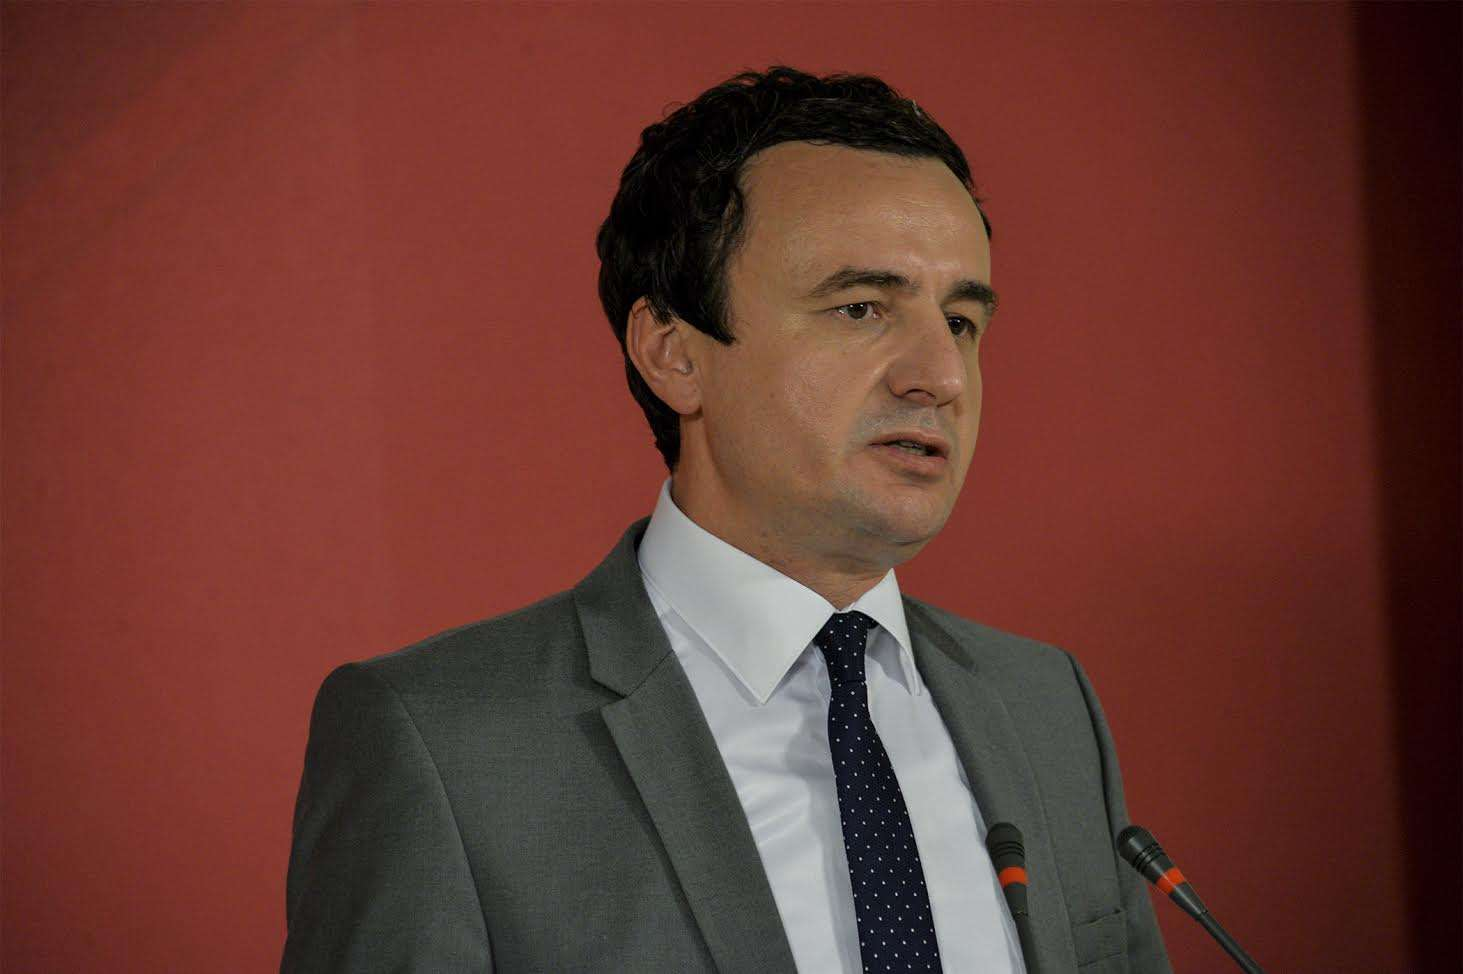 Kurti: Δεν μπορώ να μεταχειριστώ τη Βοσνία όπως τη Σερβία